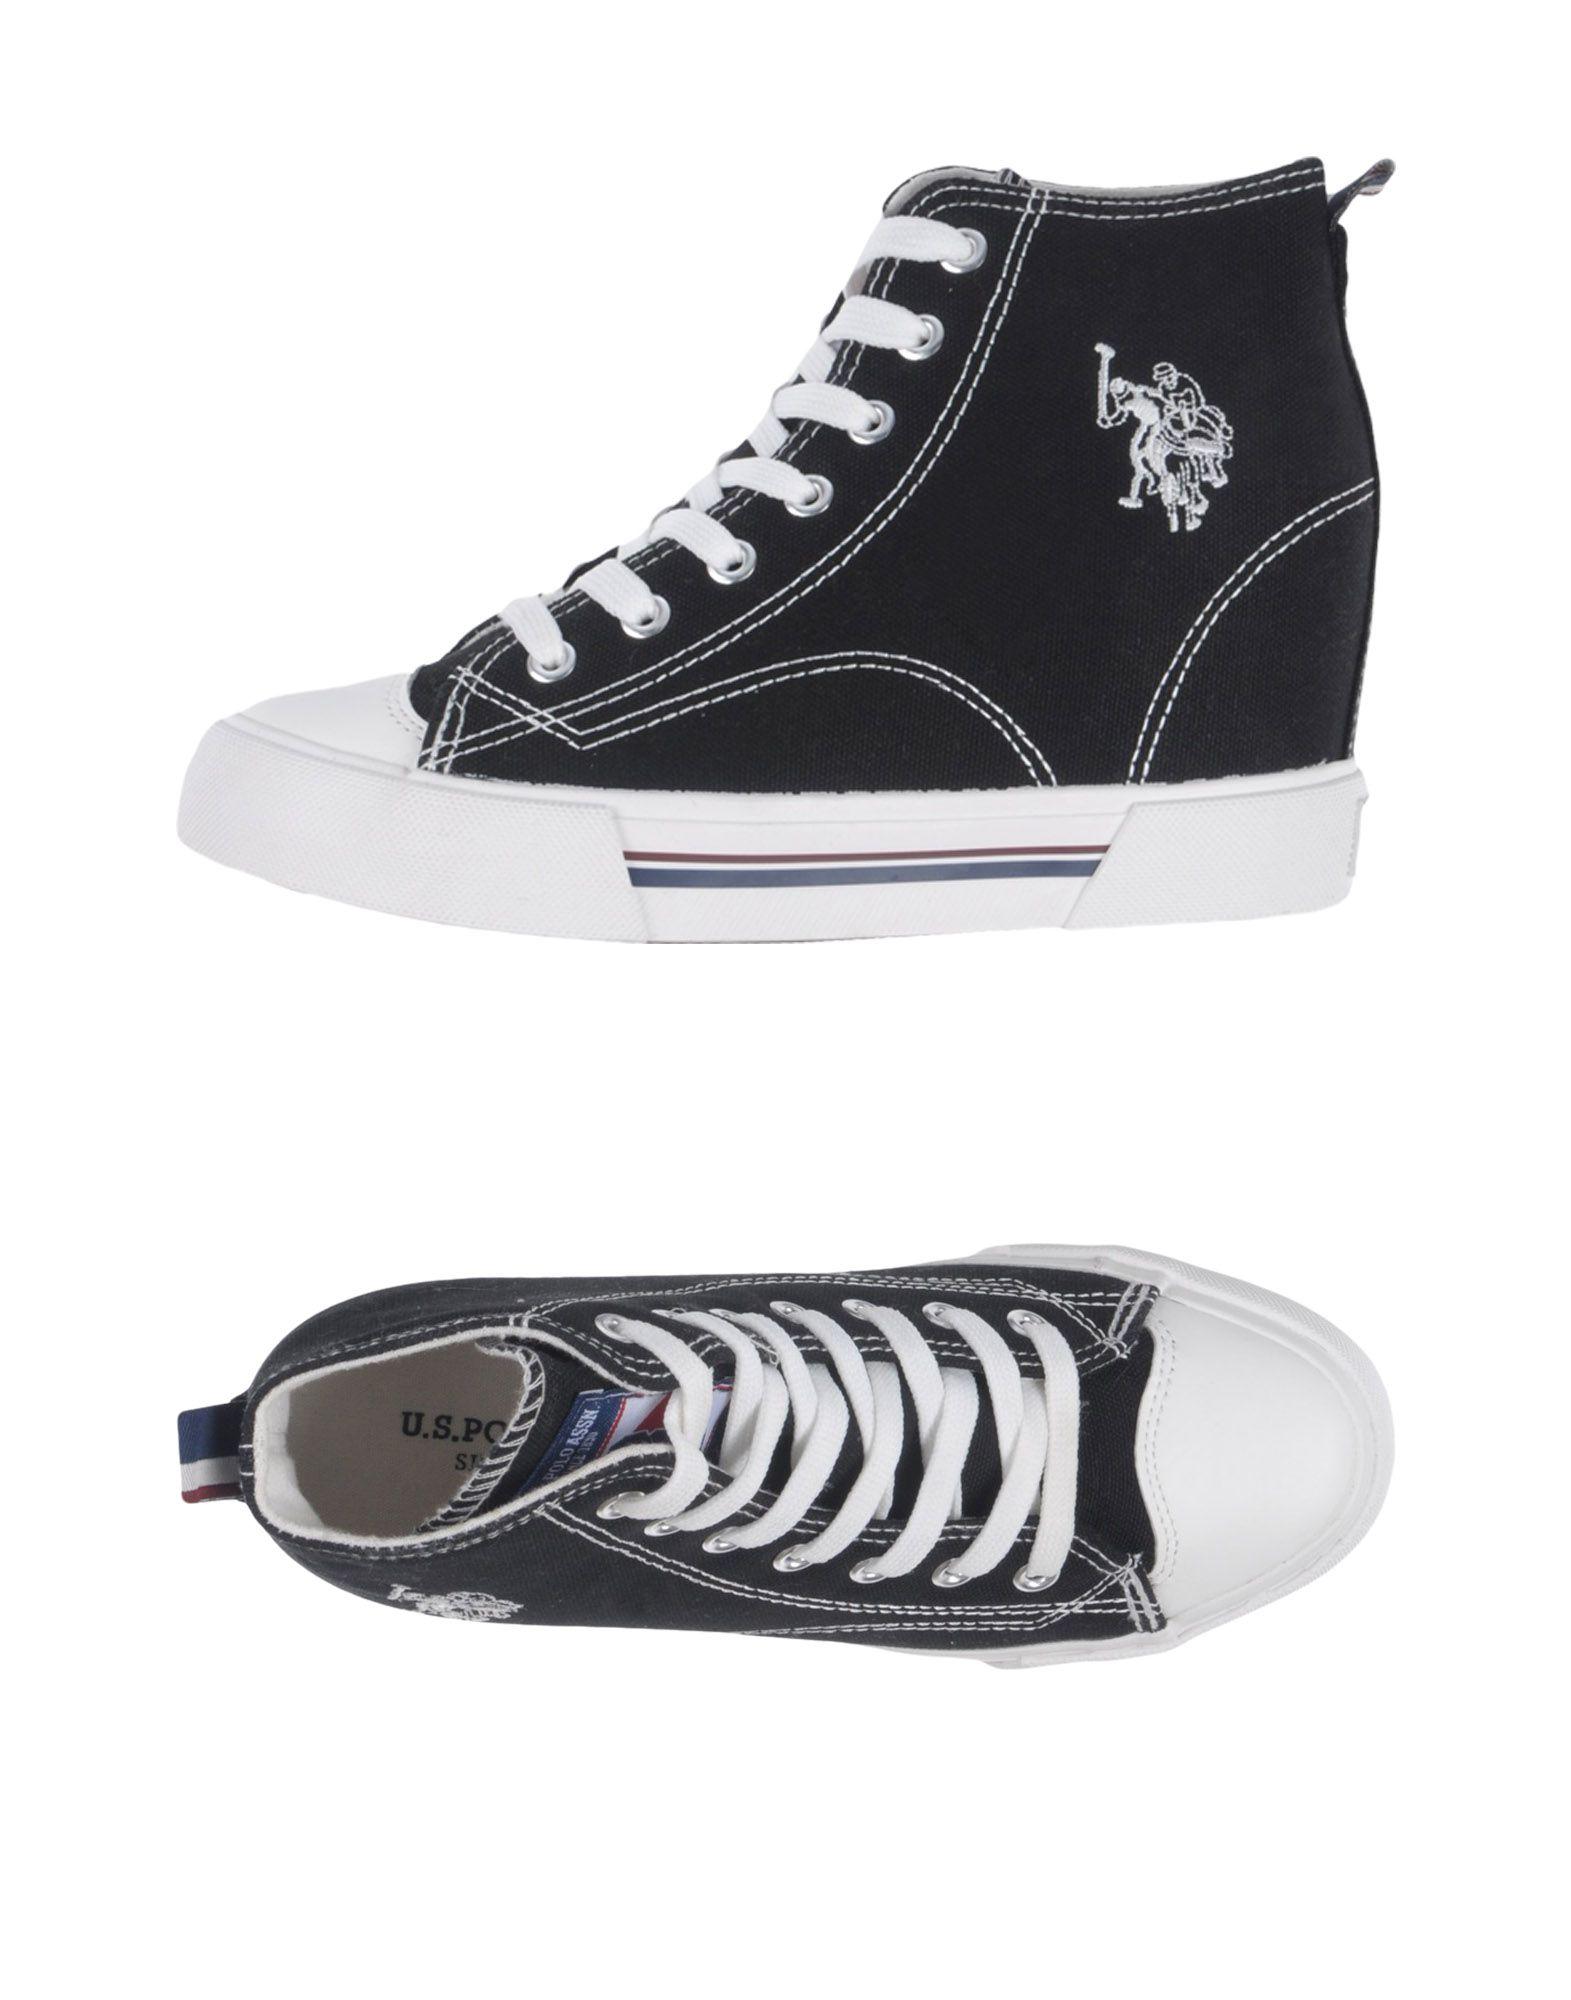 U.S.Polo Assn. Assn. Sneakers - Women U.S.Polo Assn. Assn. Sneakers online on  United Kingdom - 11387432VI 73c62e